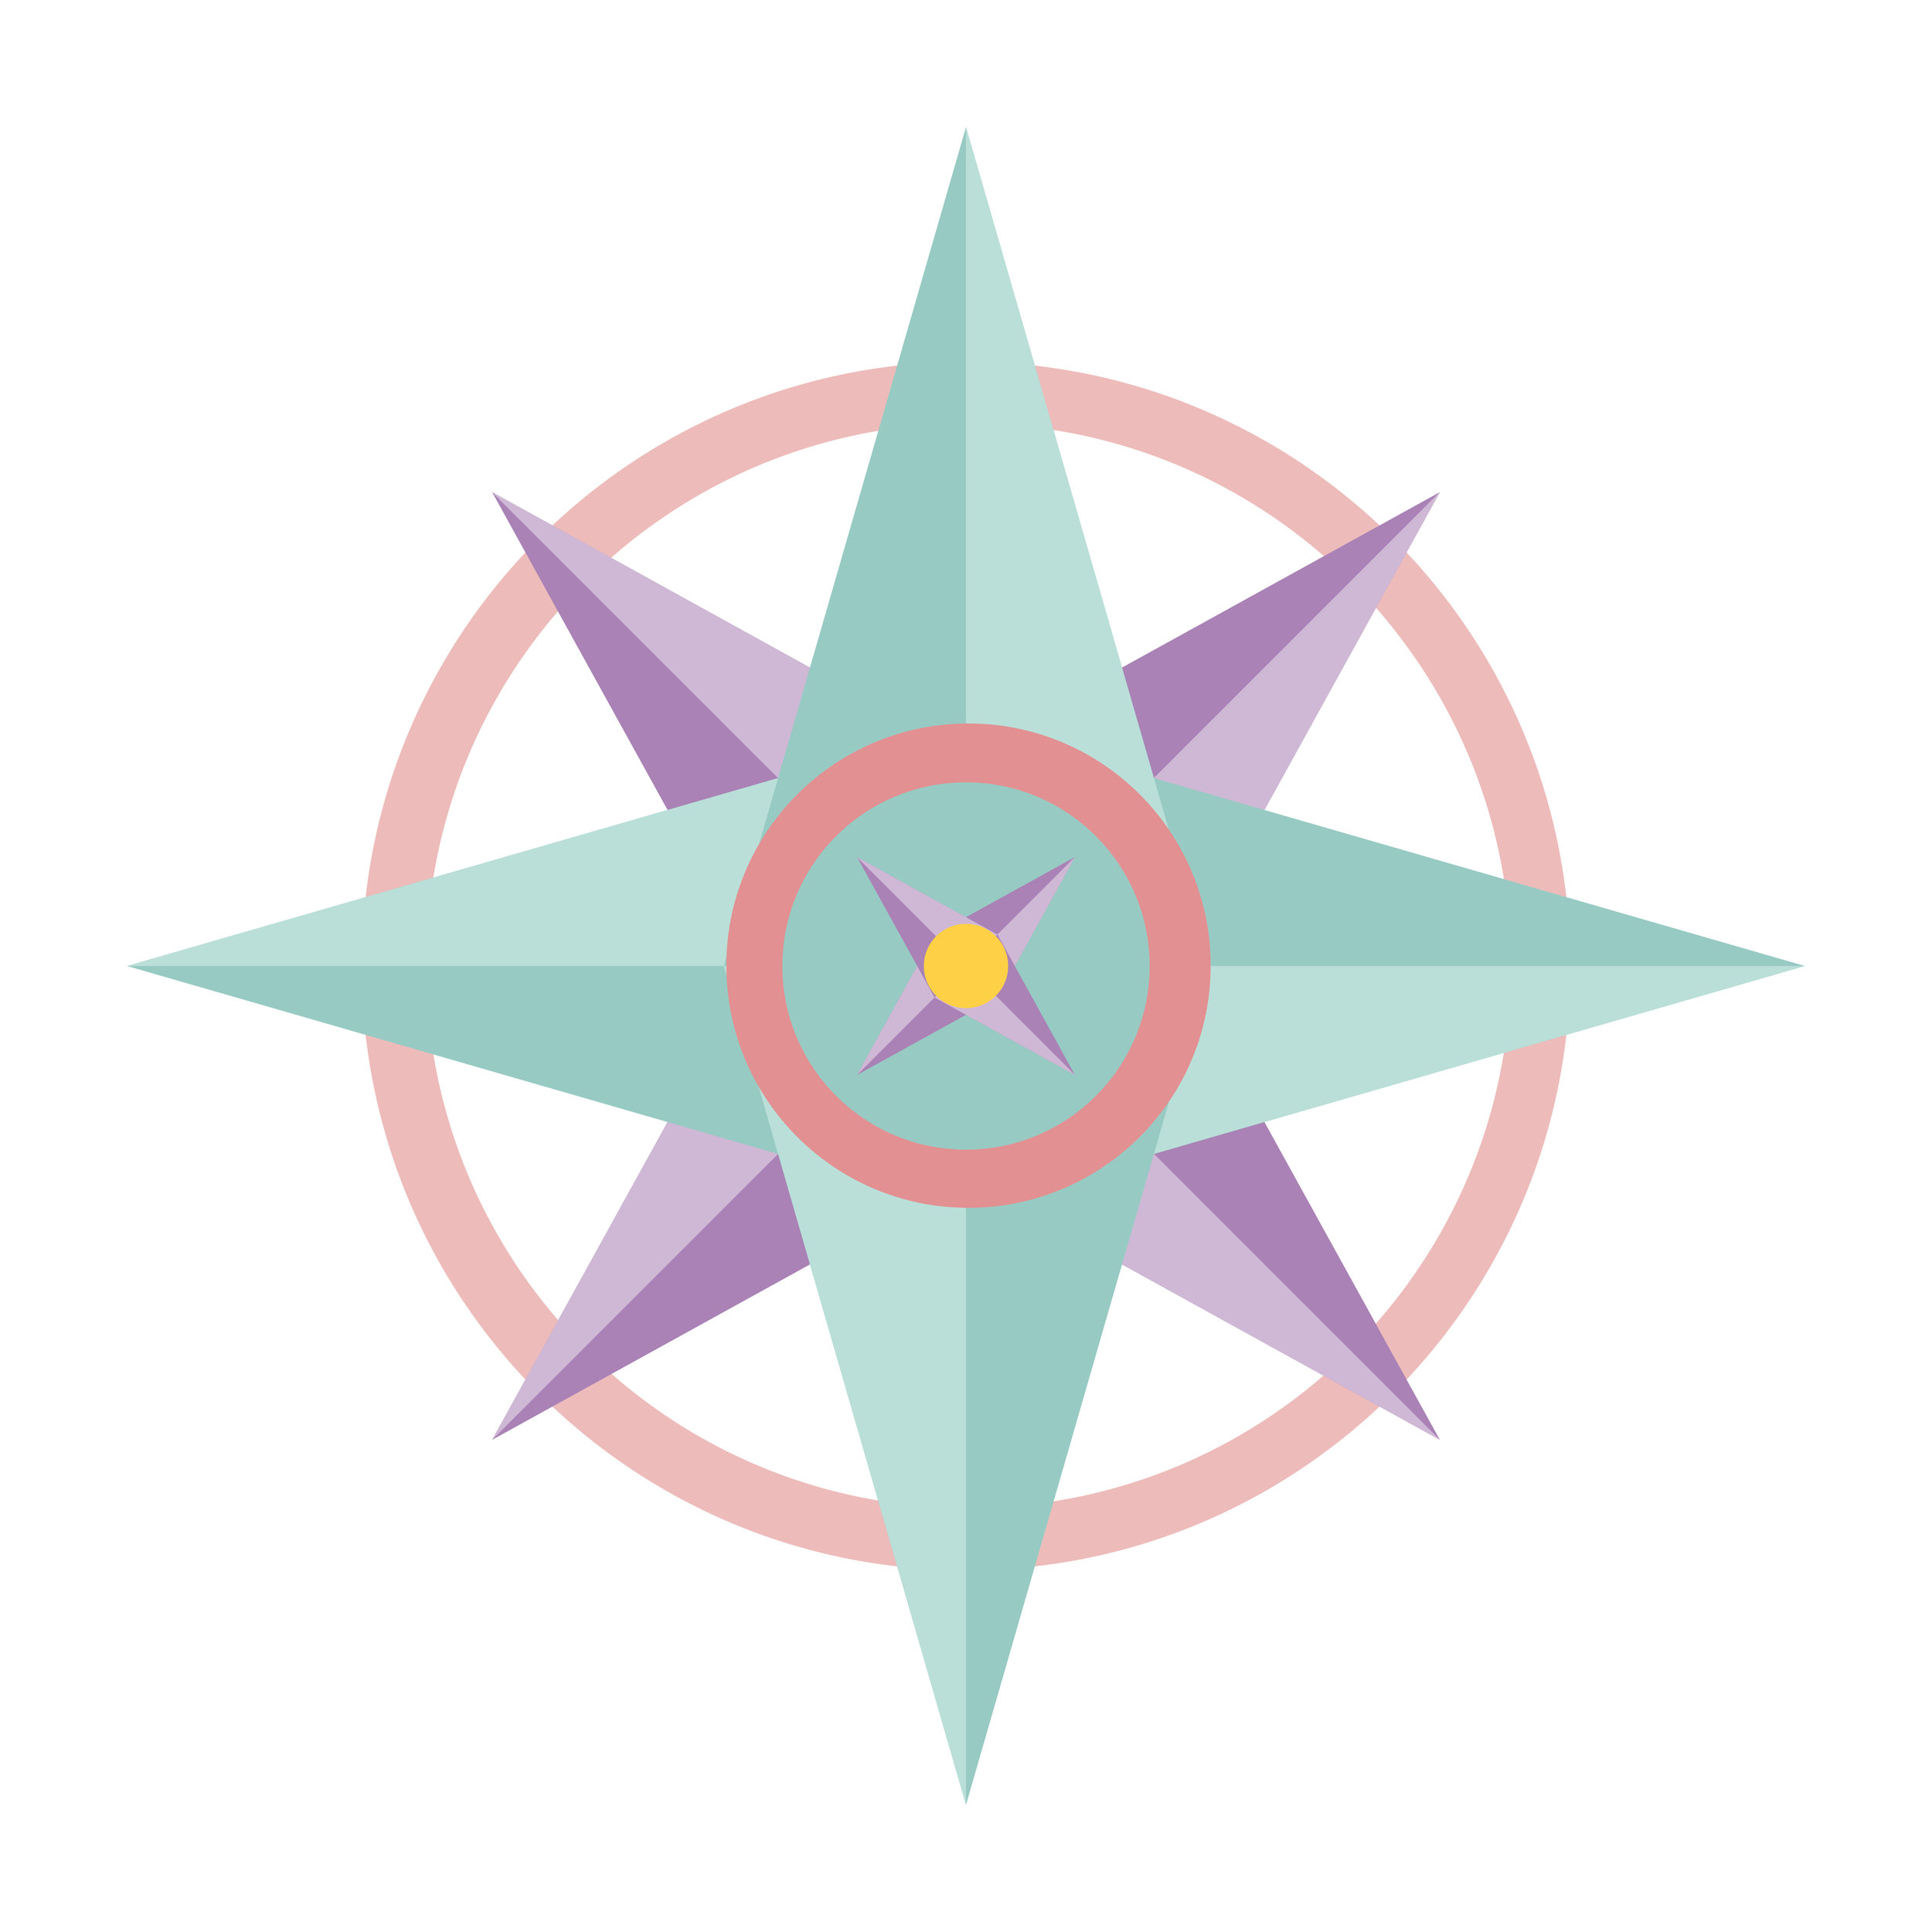 homepage-compass-icon.jpg